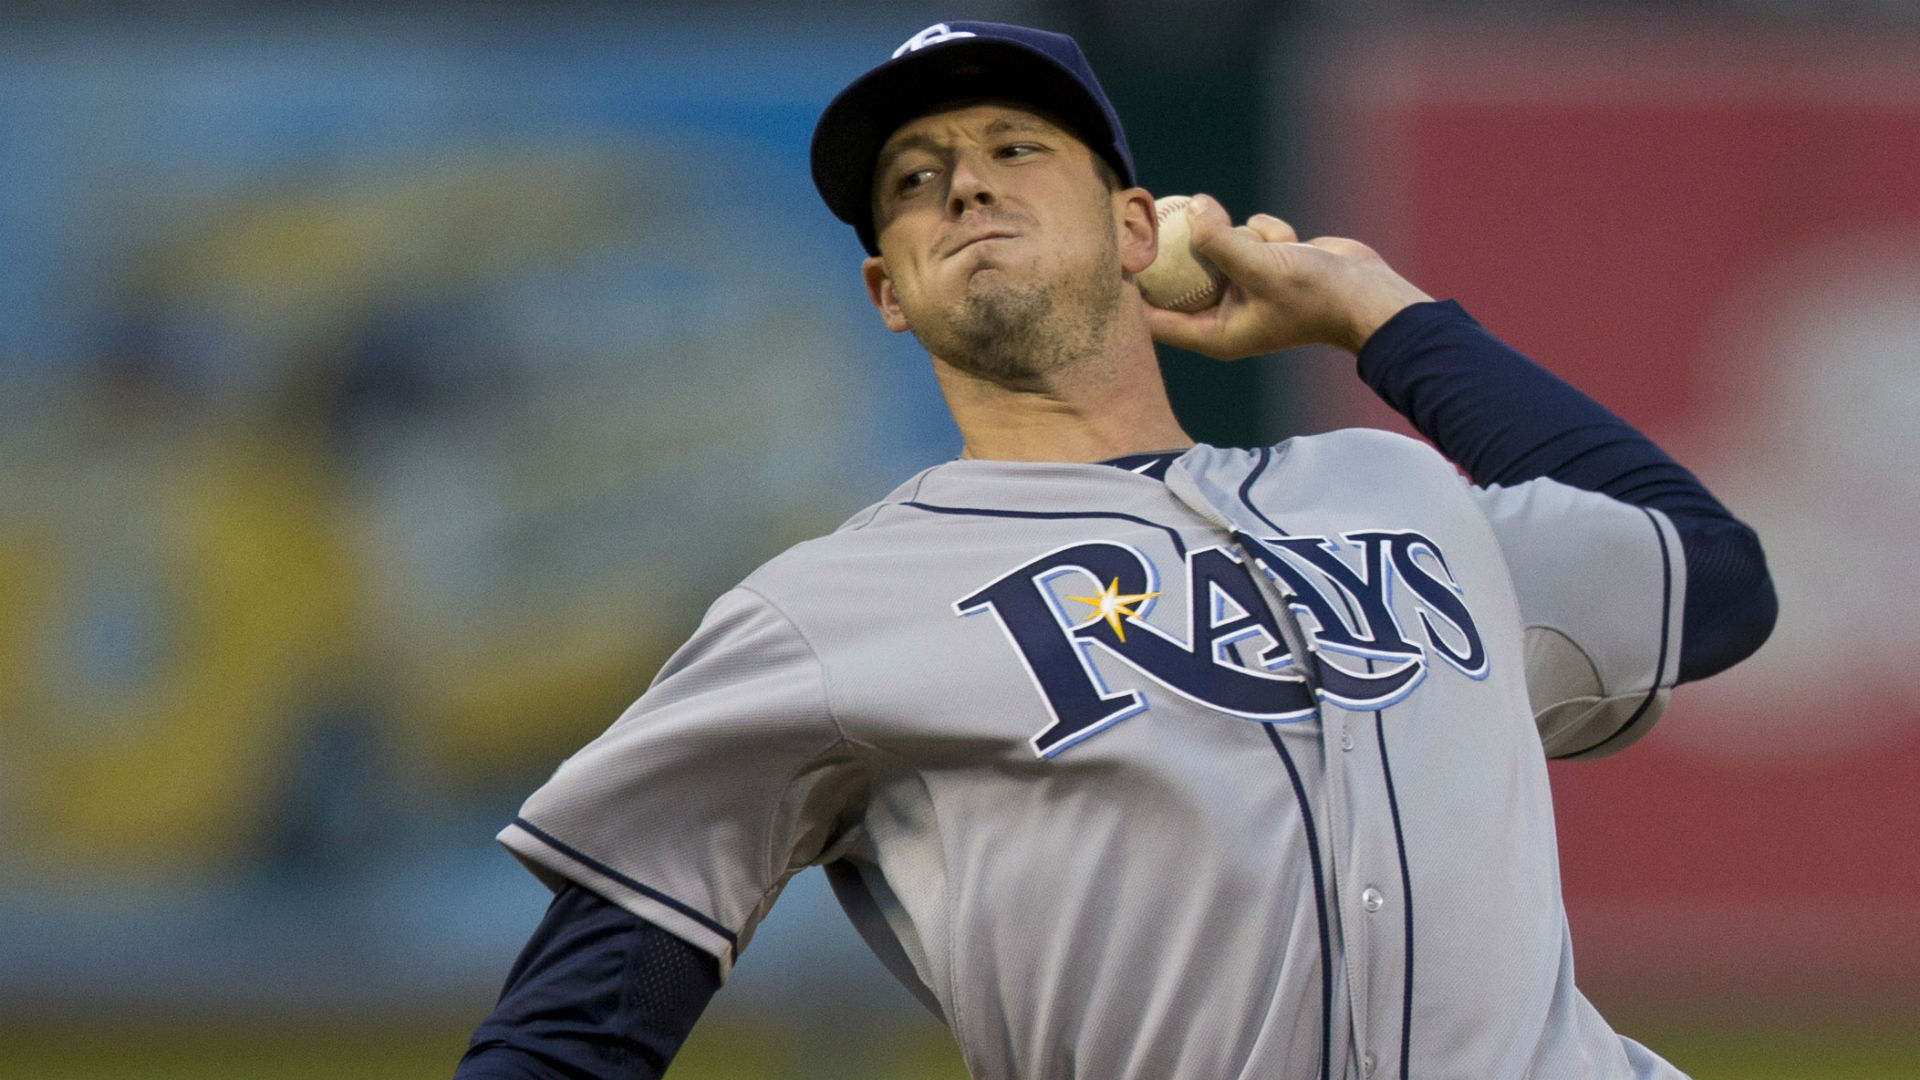 Rays pitcher Drew Smyly